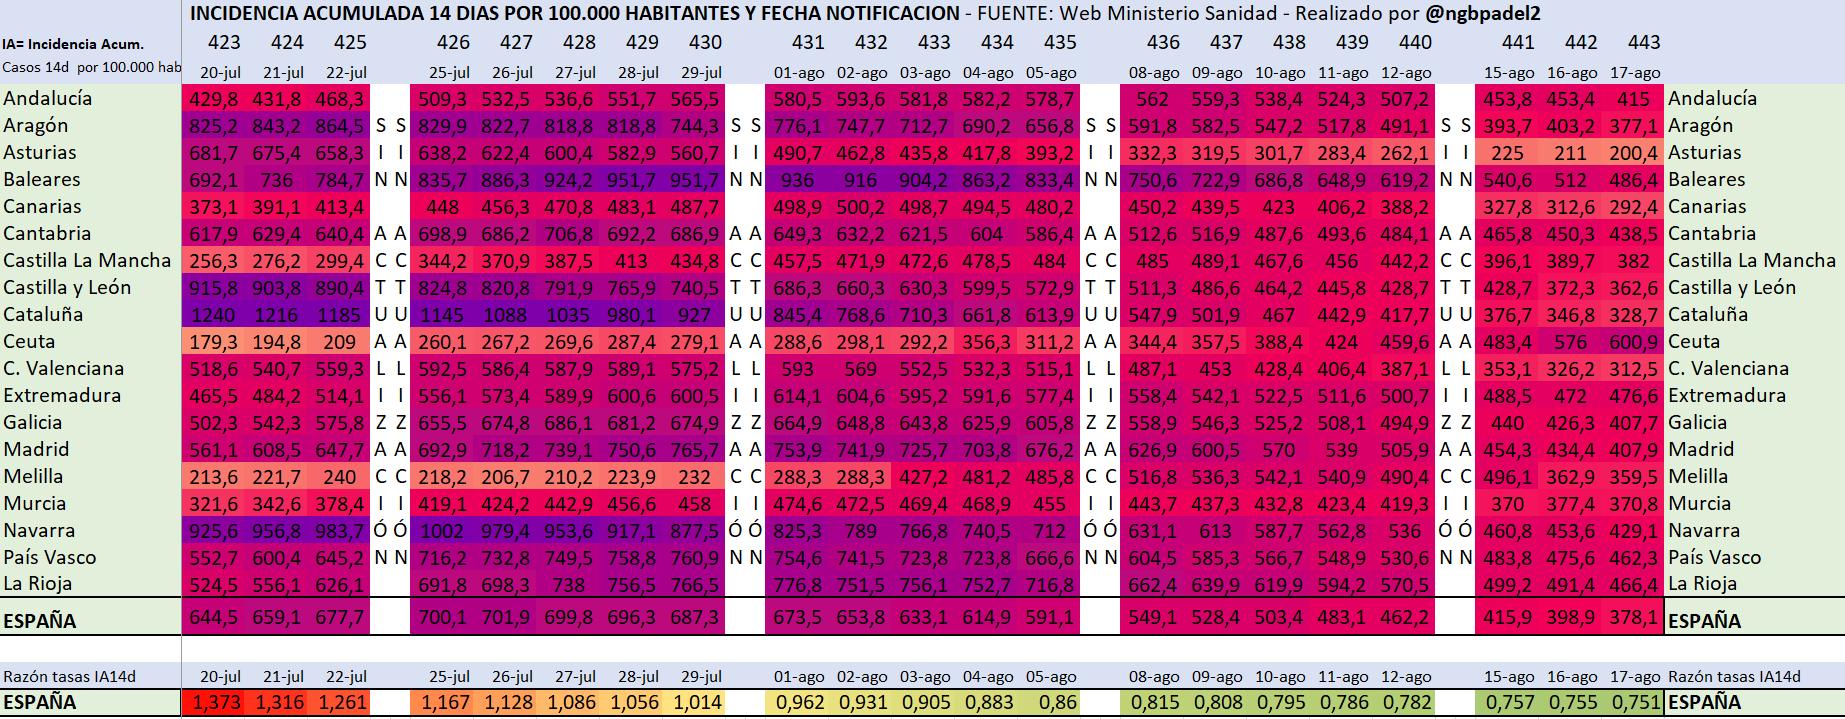 ☣ CORONAVIRUS ☣ - Minuto y Reconfinado - Vol. 144: The Neverending Topic - Página 6 E9Ghg7vXEAso8Y1?format=png&name=large